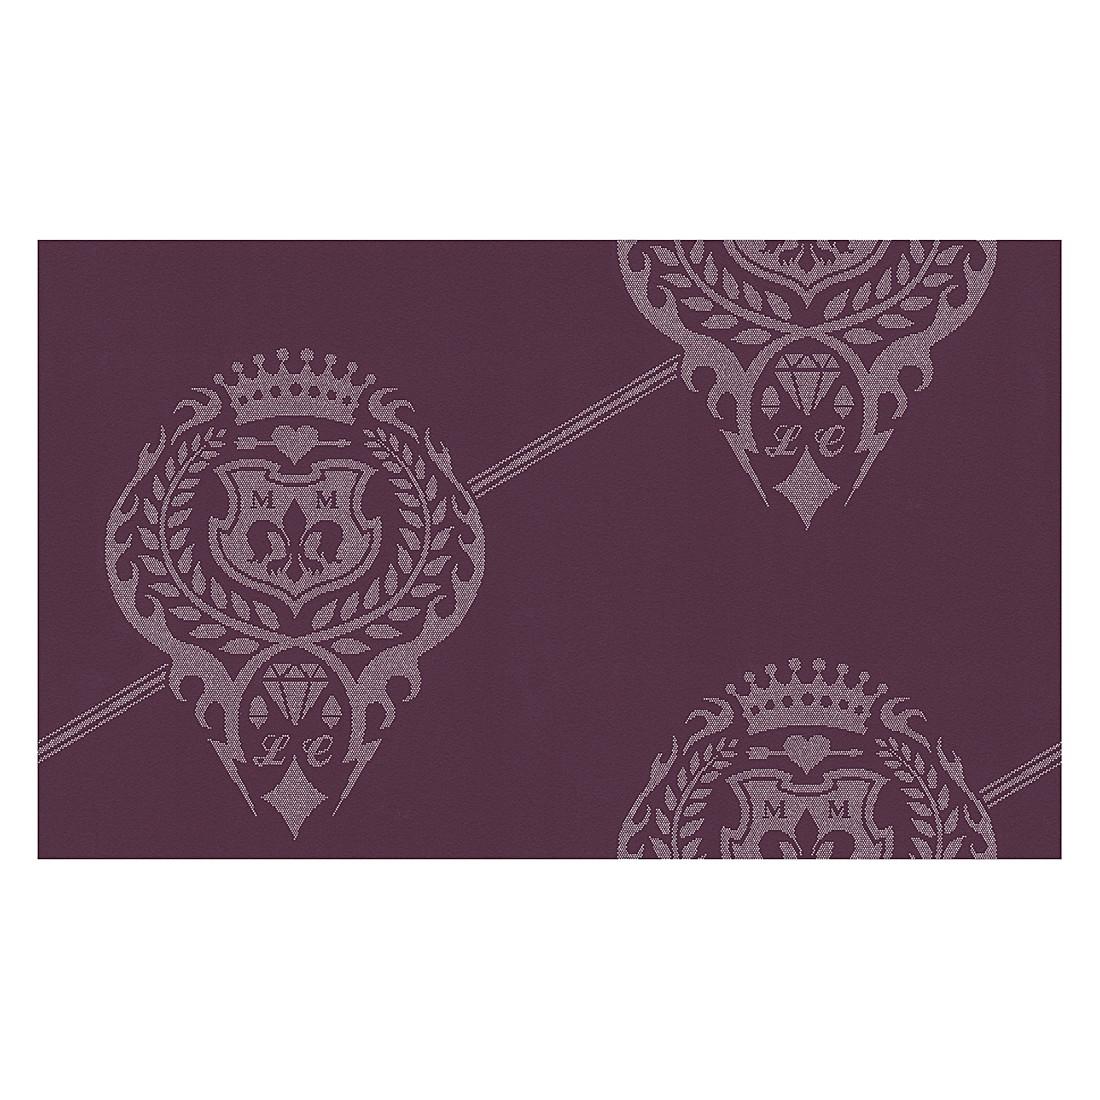 vliestapete kingly crest purpurviolett silberfarben. Black Bedroom Furniture Sets. Home Design Ideas